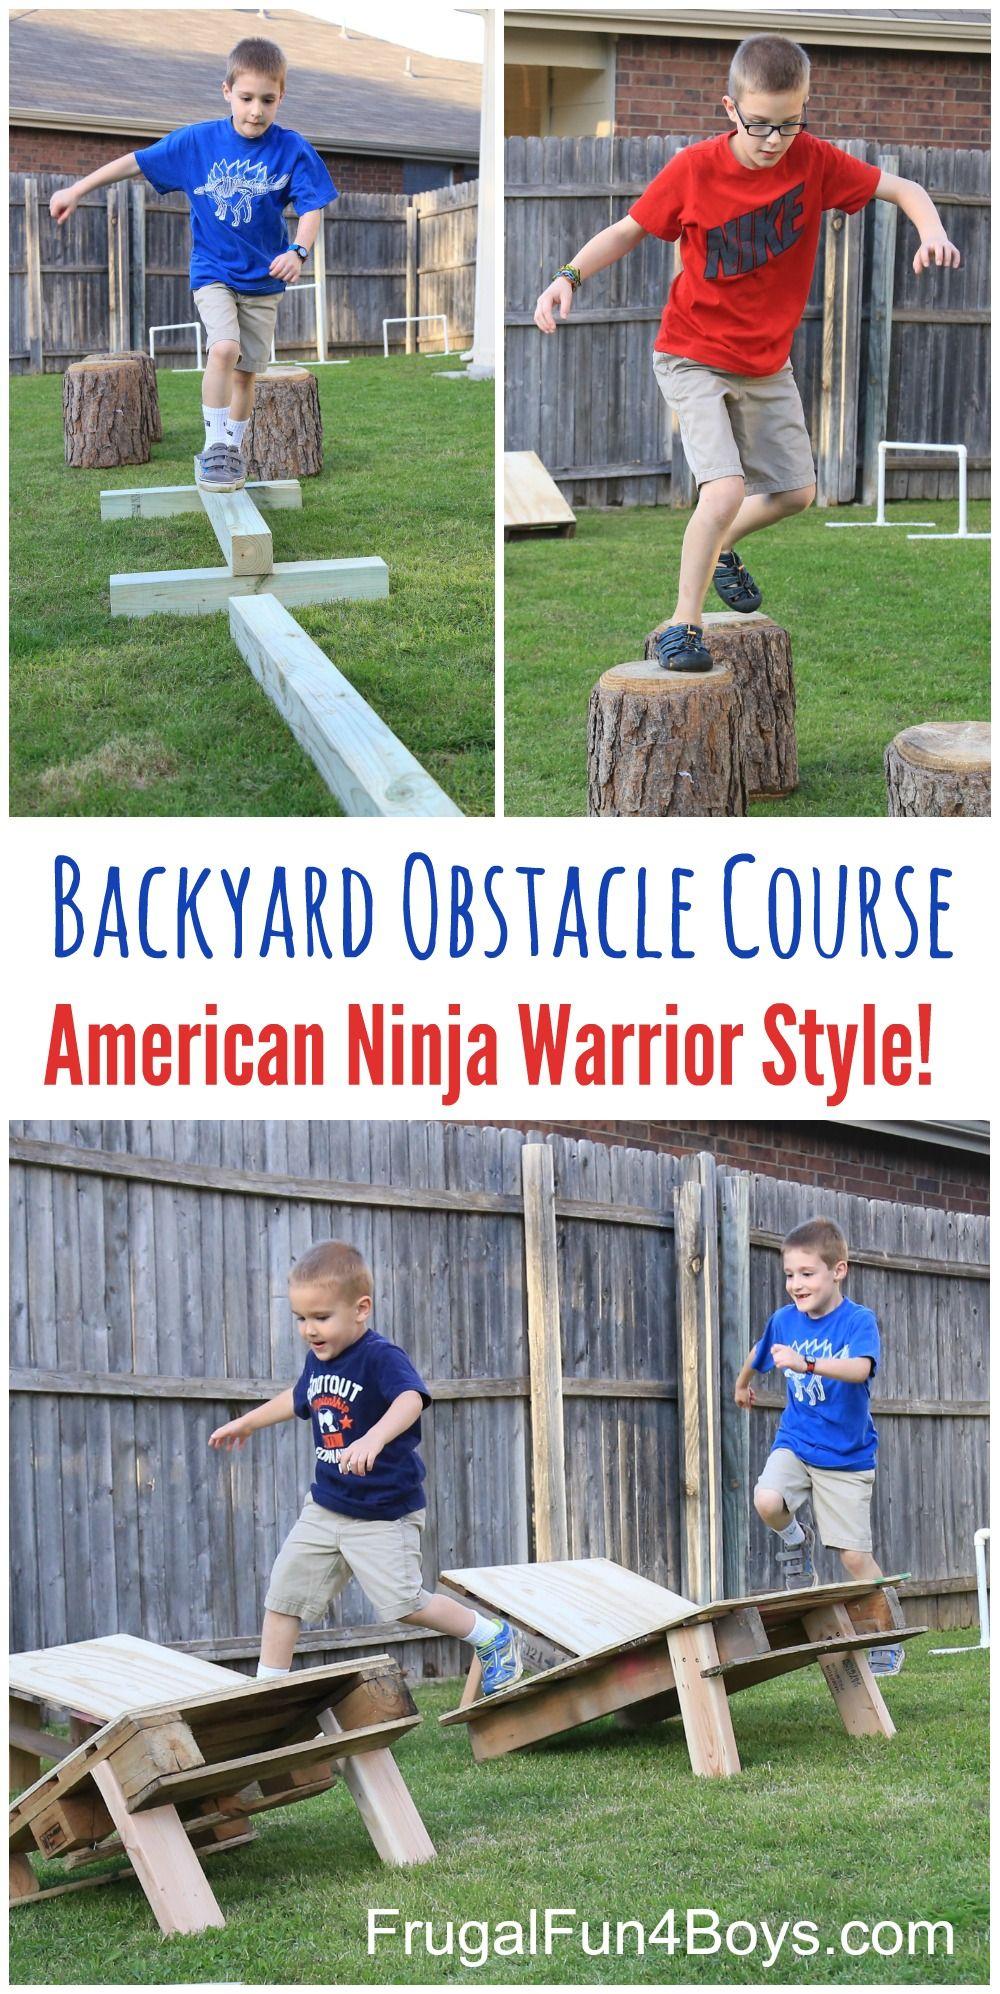 20.SIMPHOME.COM diy american ninja warrior backyard obstacle course frugal fun